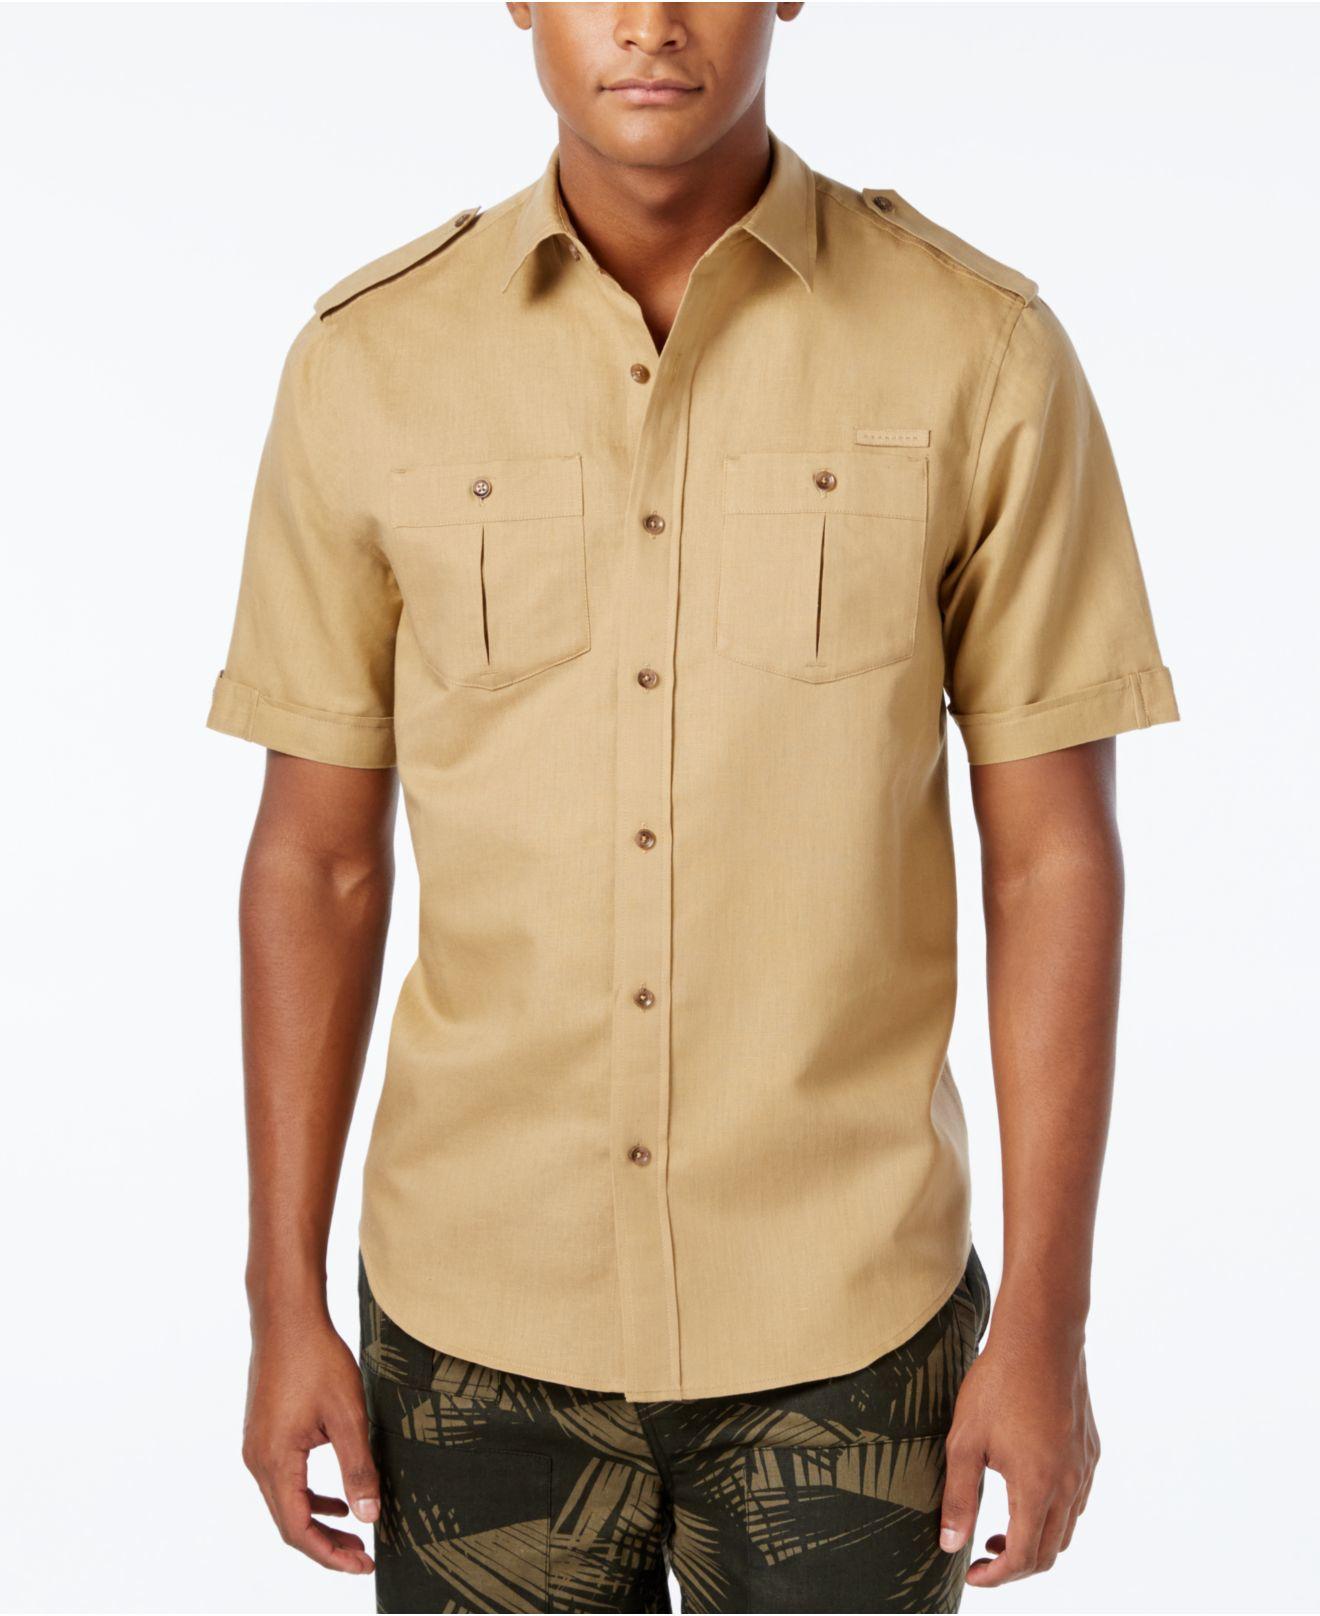 Sean john men 39 s solid linen short sleeve shirt in brown for Sean john t shirts for mens